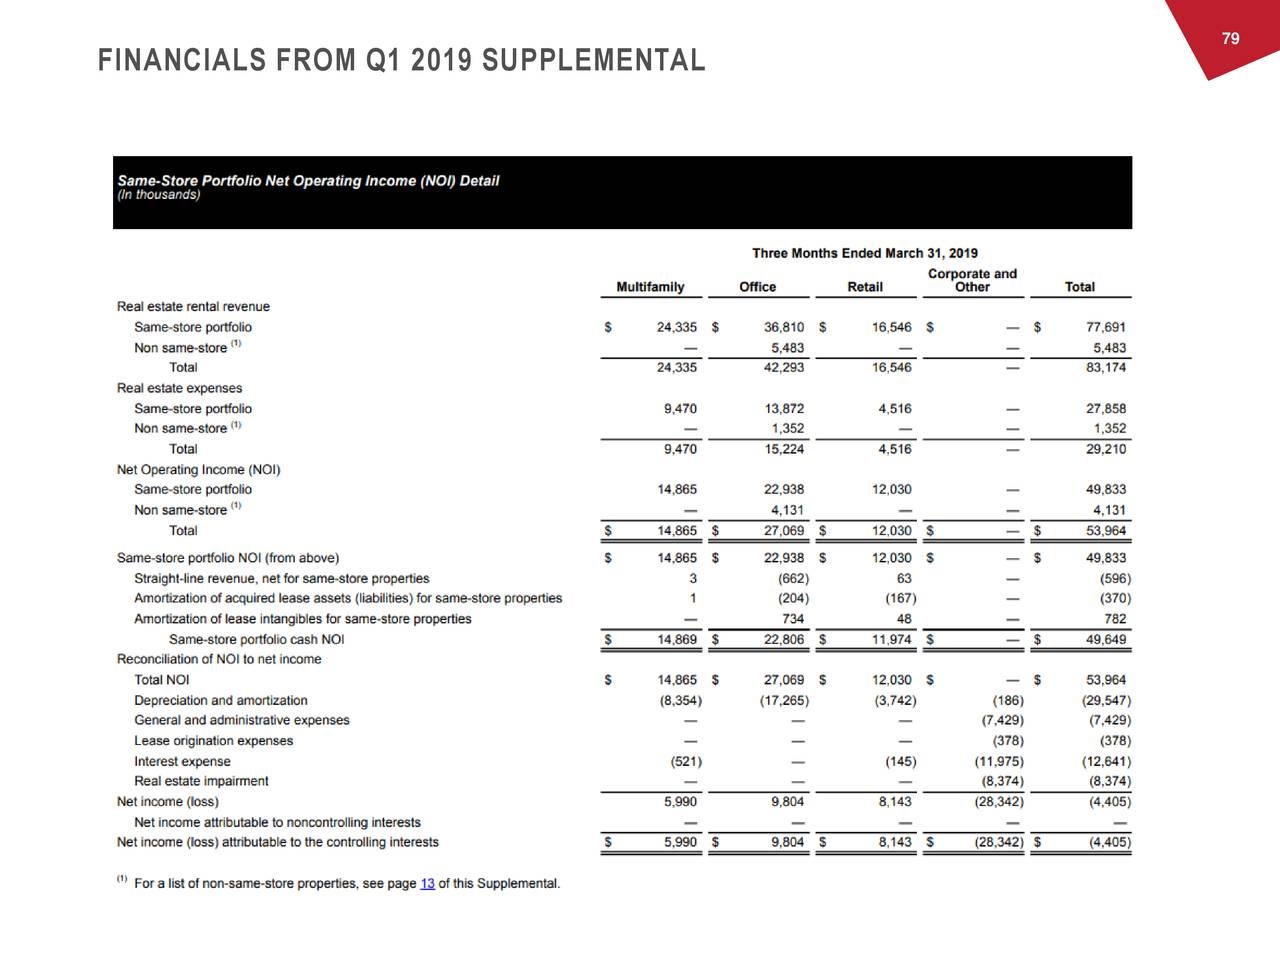 FINANCIALS FROM Q1 2019 SUPPLEMENTAL